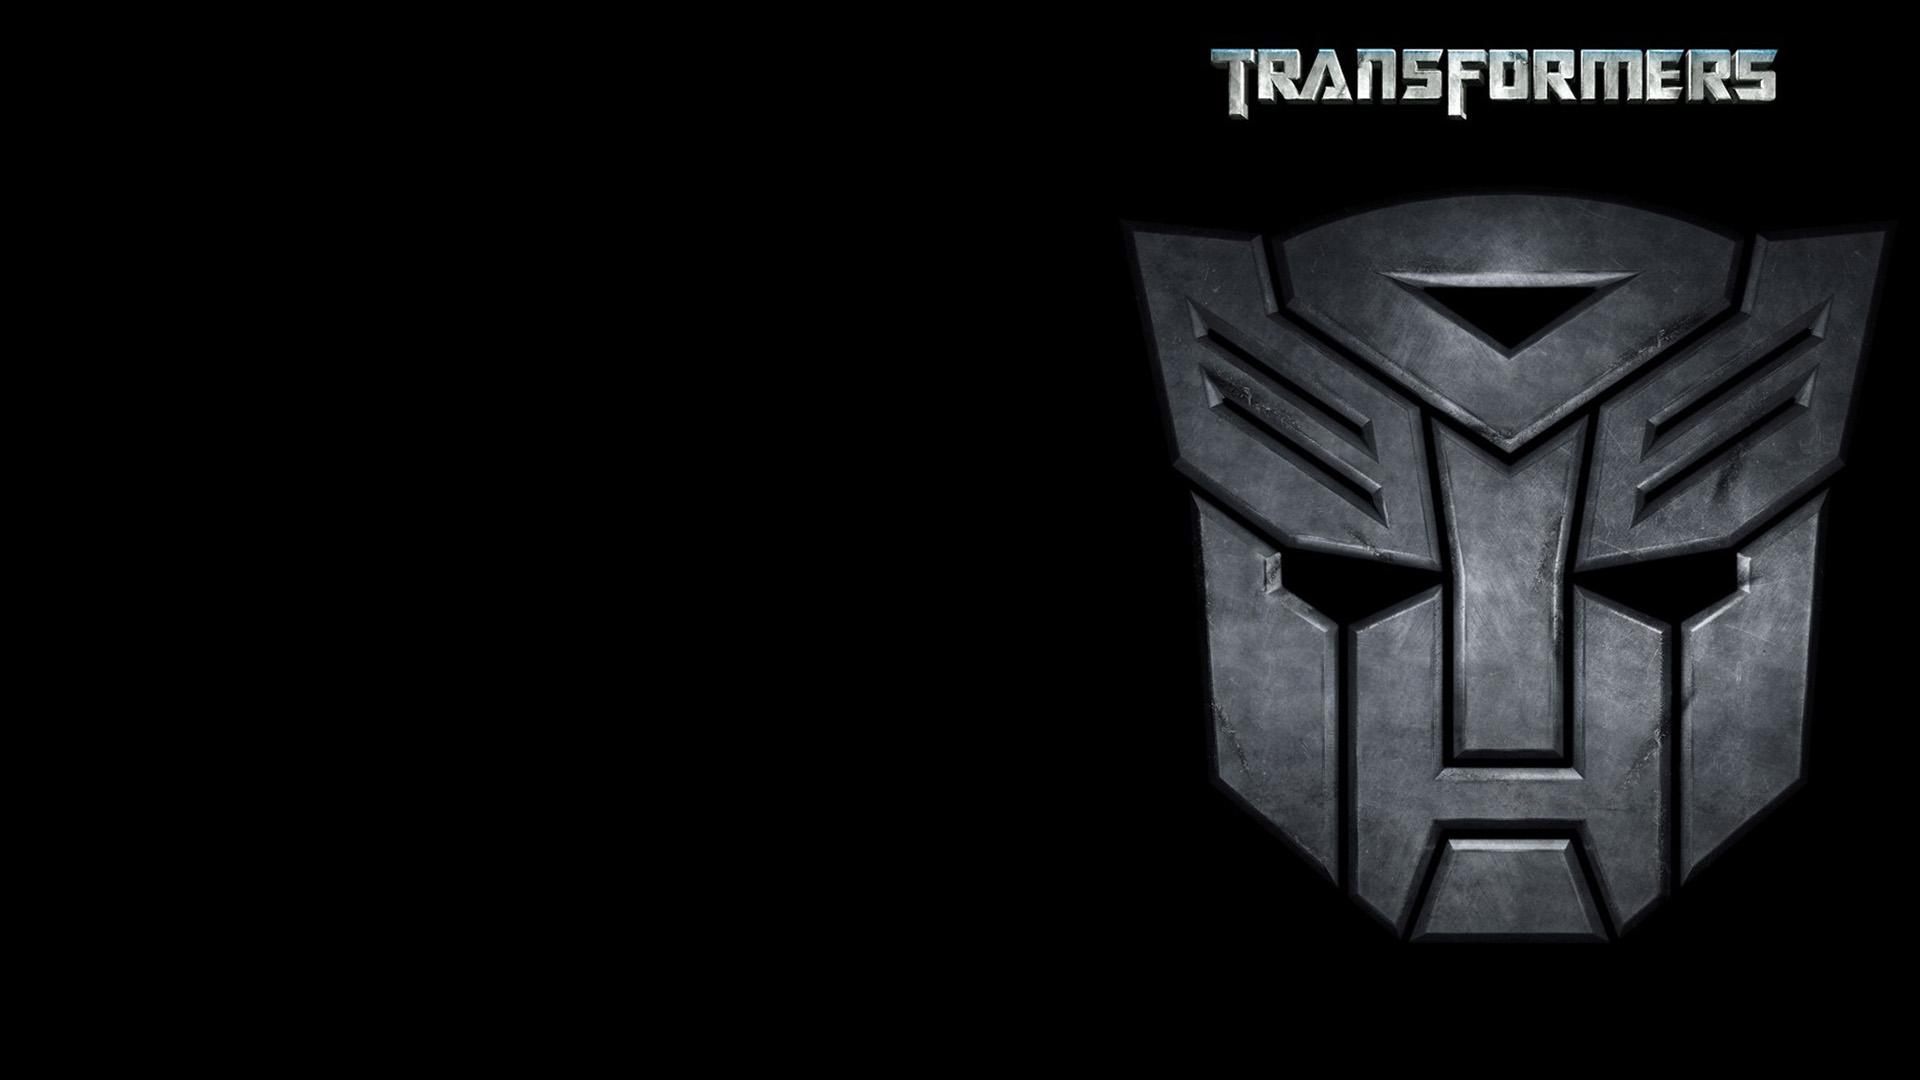 1920 1080 autobotsx transformers logo right digital citizen